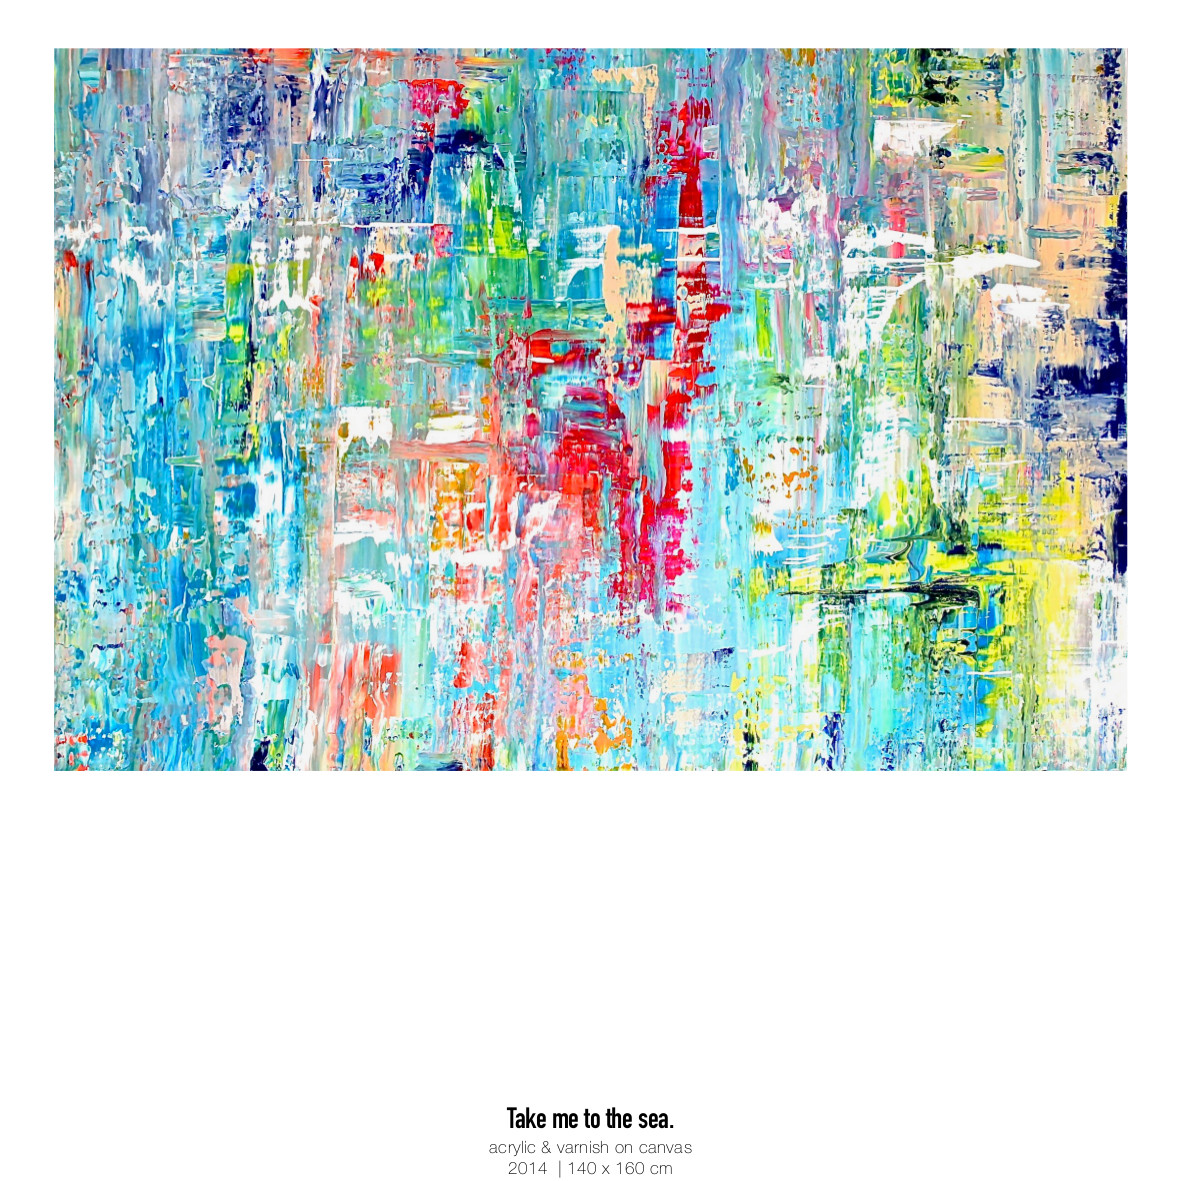 Theresa Kallrath Kallart_Take me to the sea_Artist_Art_Contemporary Art